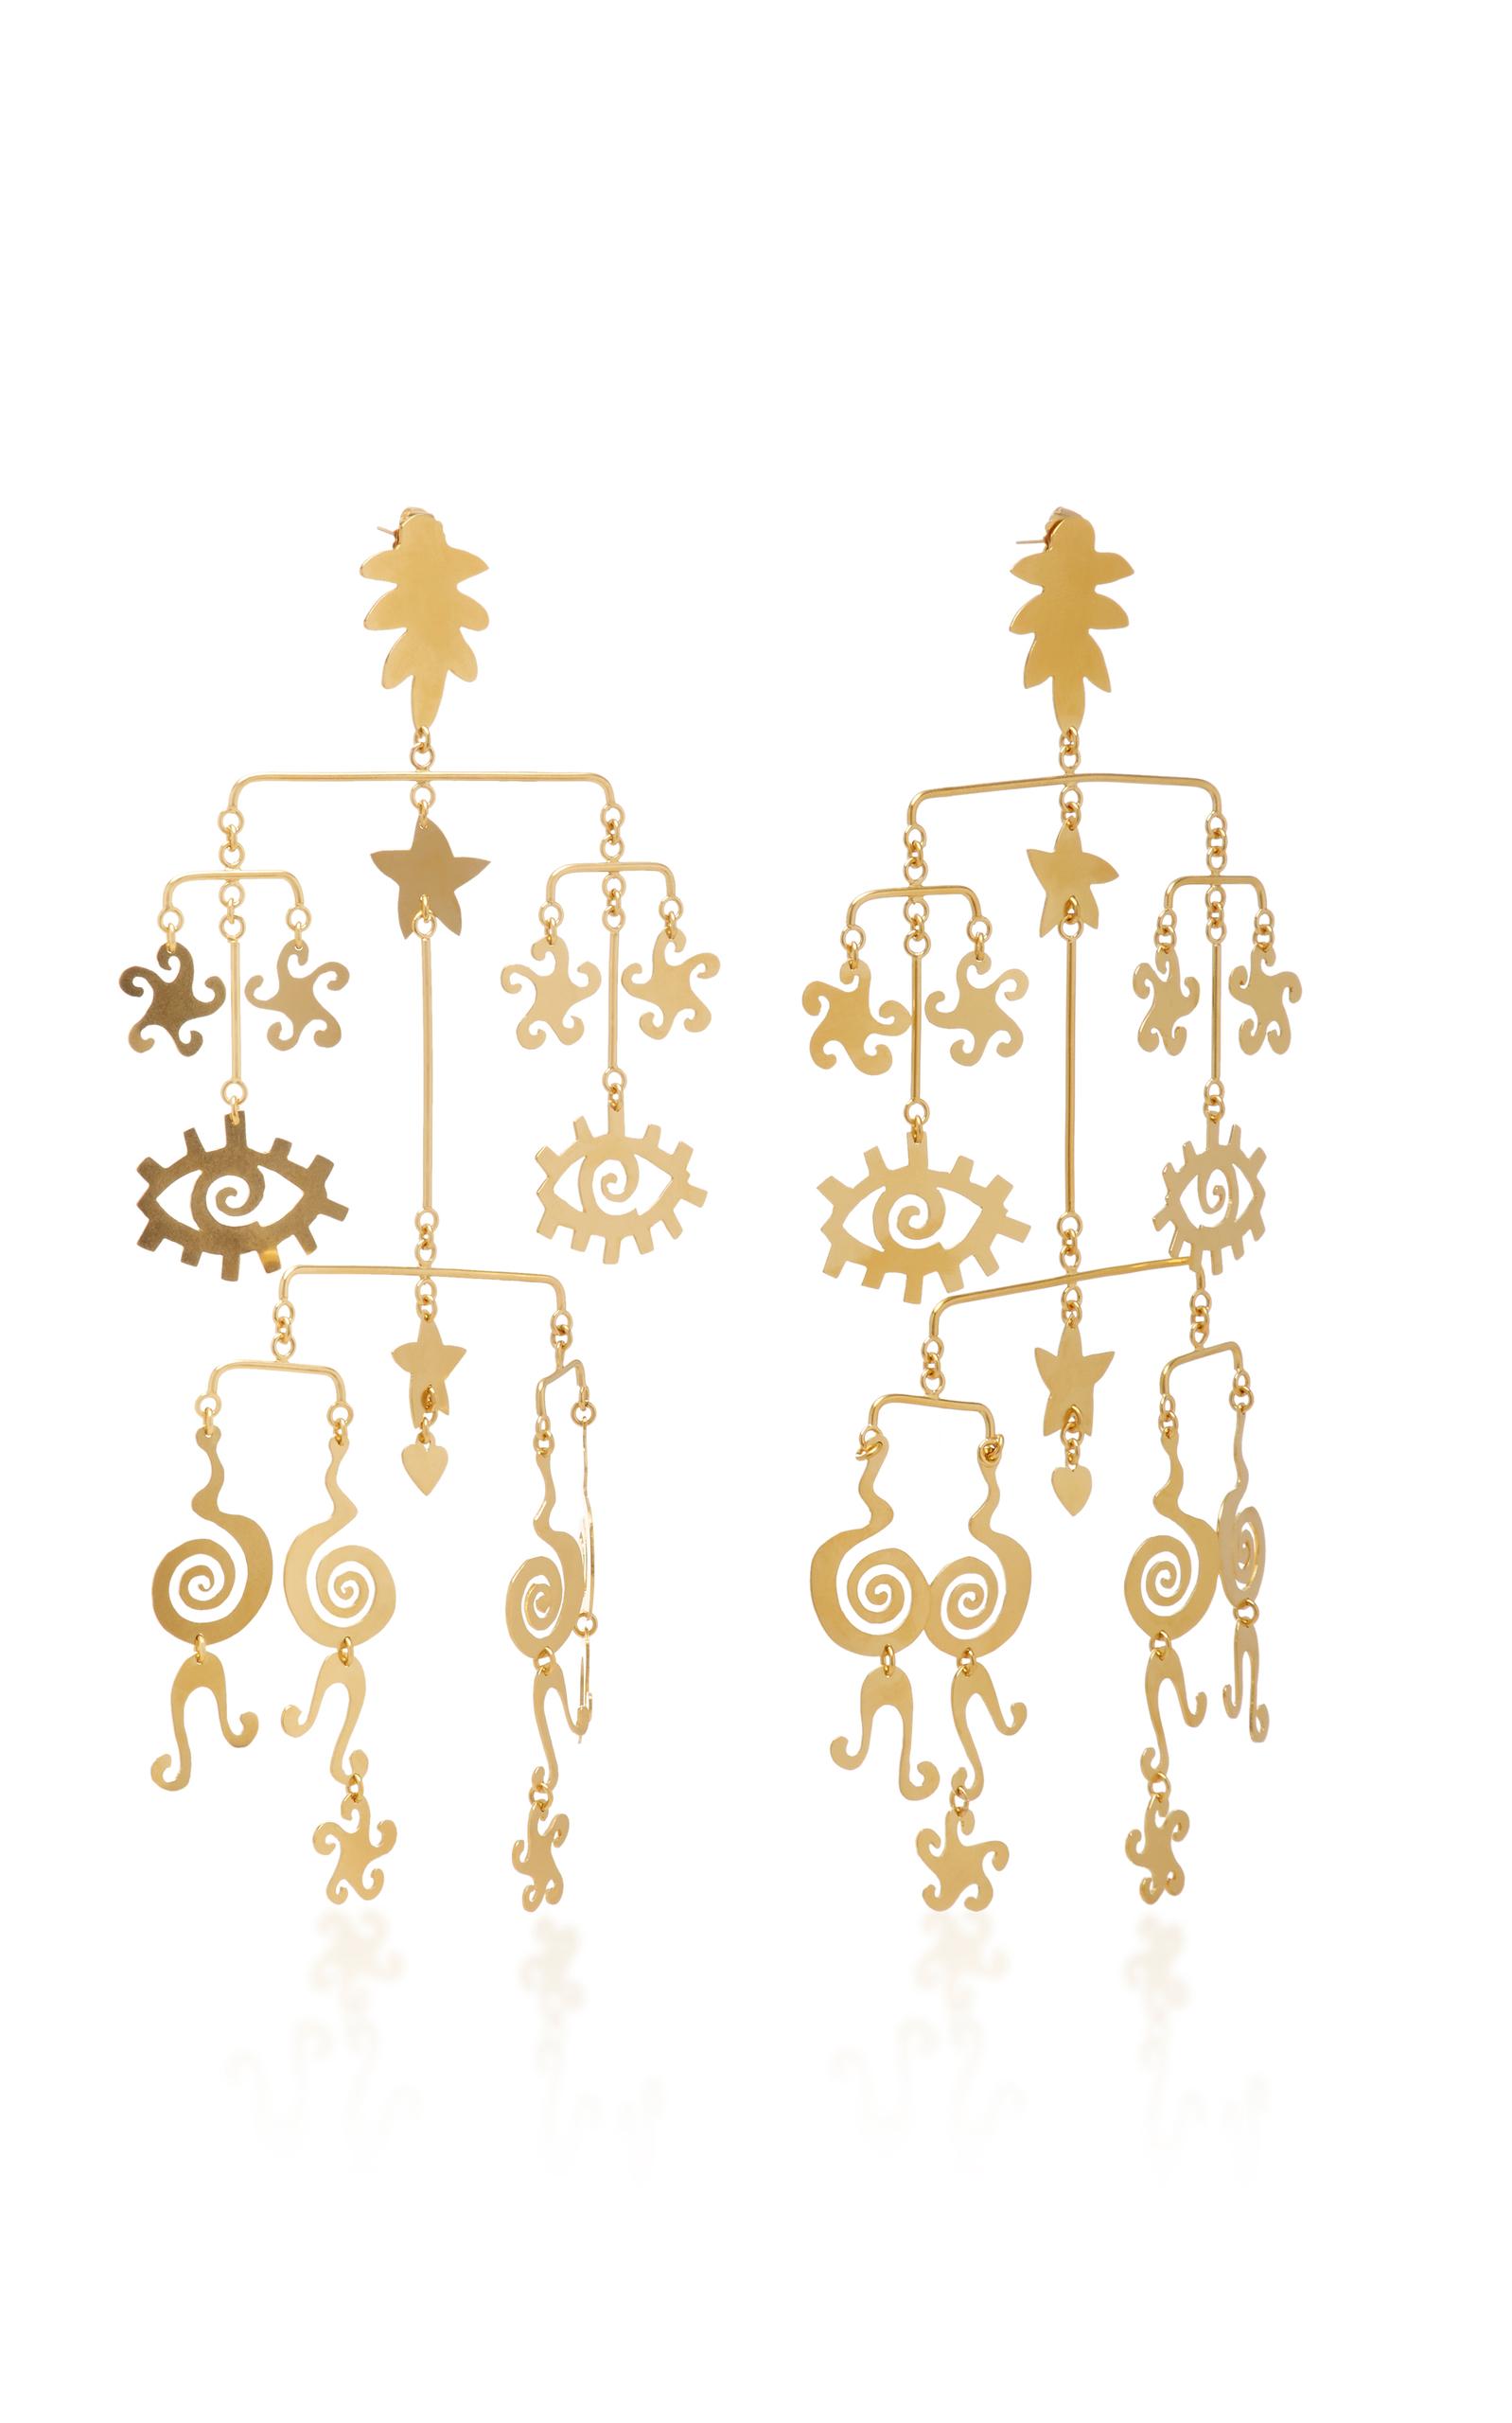 Gold-Plated Brass Mobile Earrings Kalmar icw3L